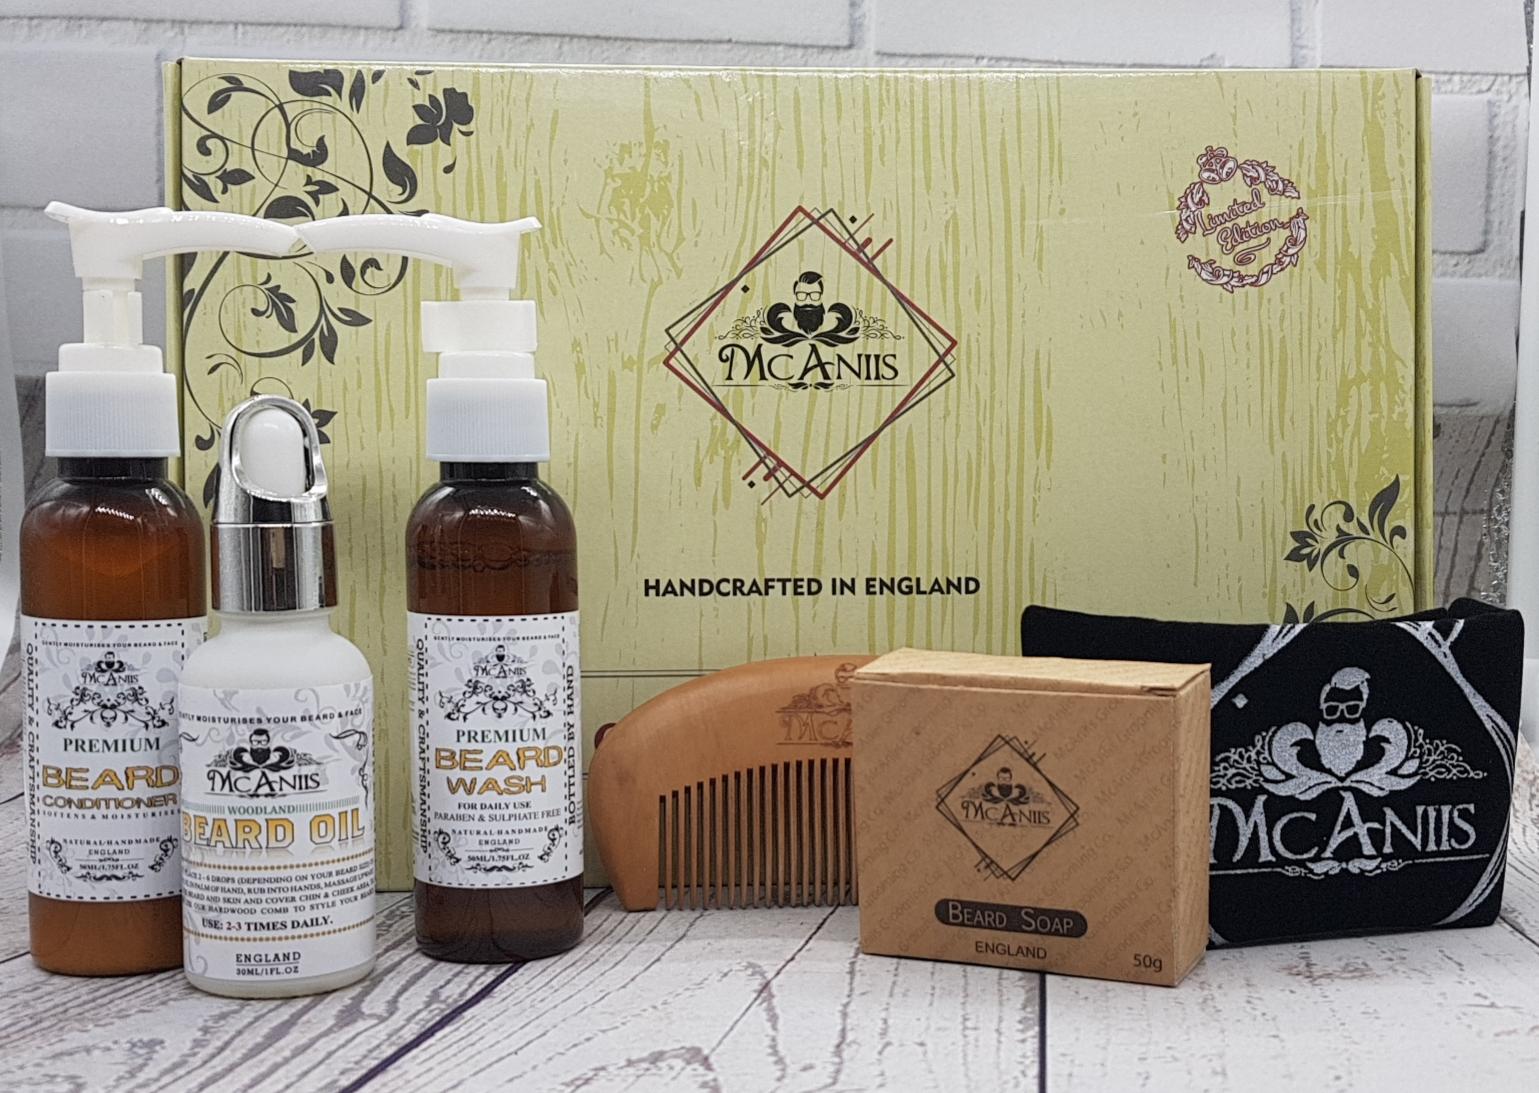 McAniis Premium XL Beard Grooming Kit - 6 Pieces - Limited Edition